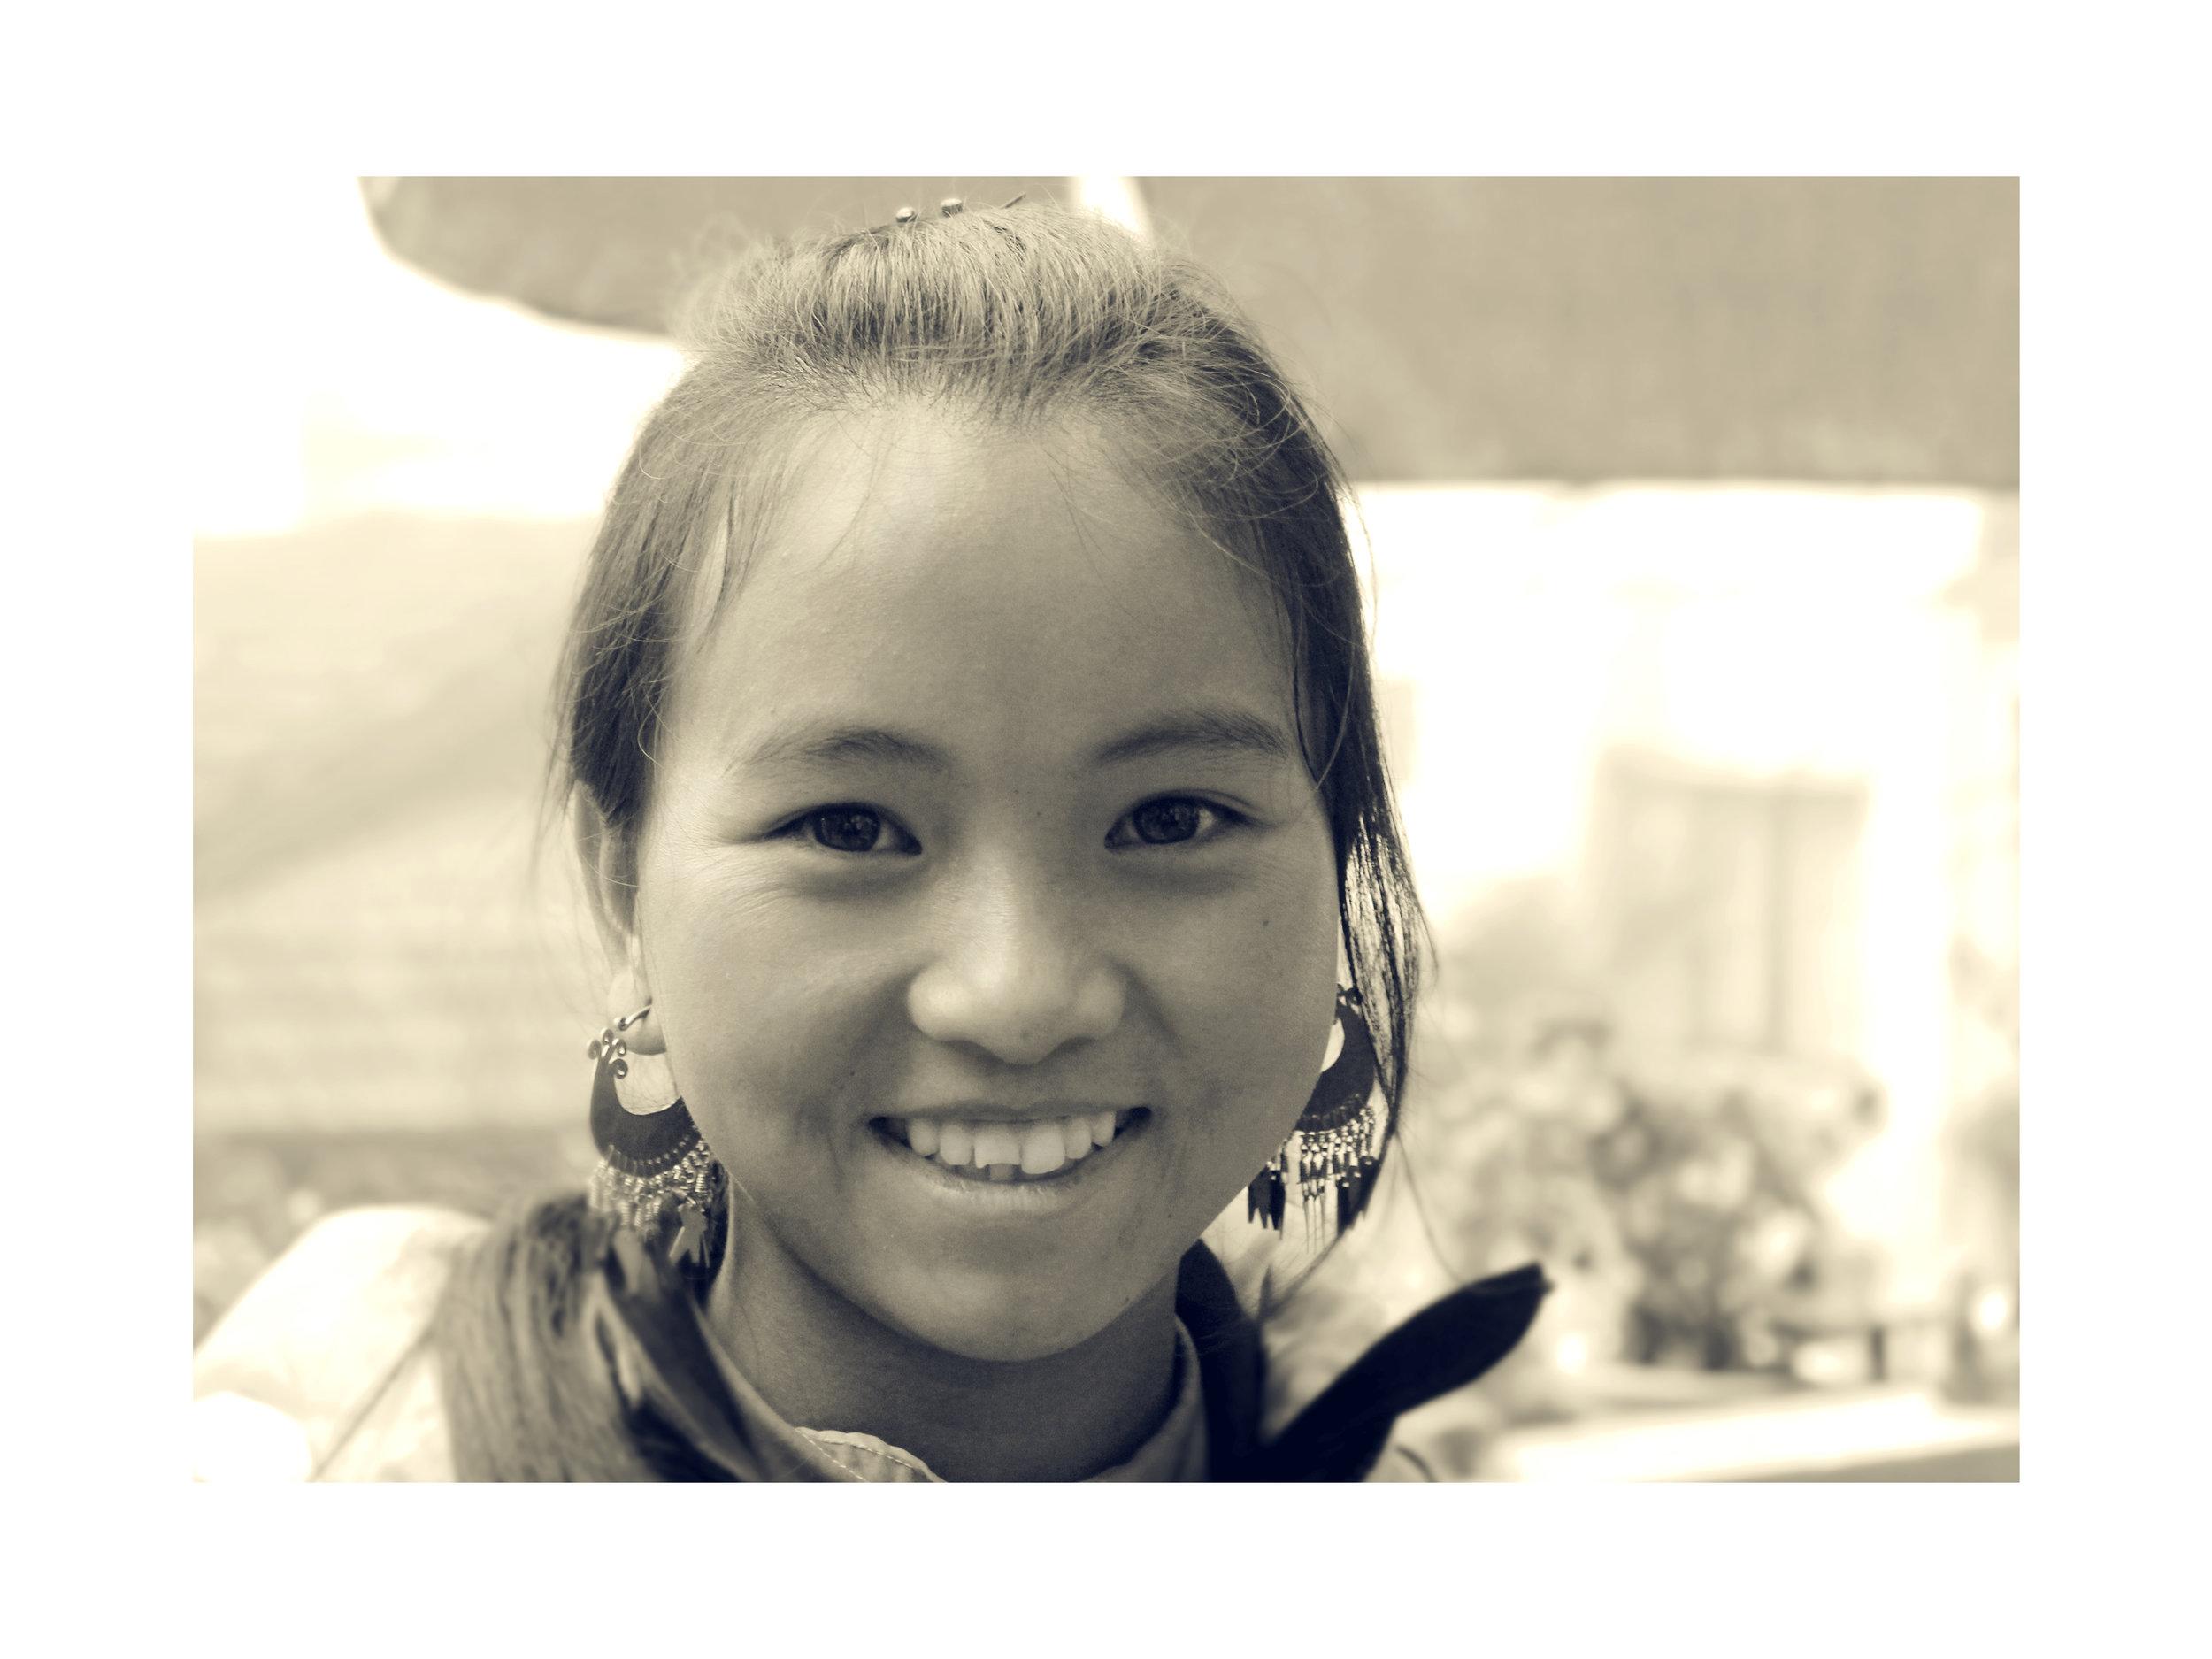 JW_face VI_018.jpg